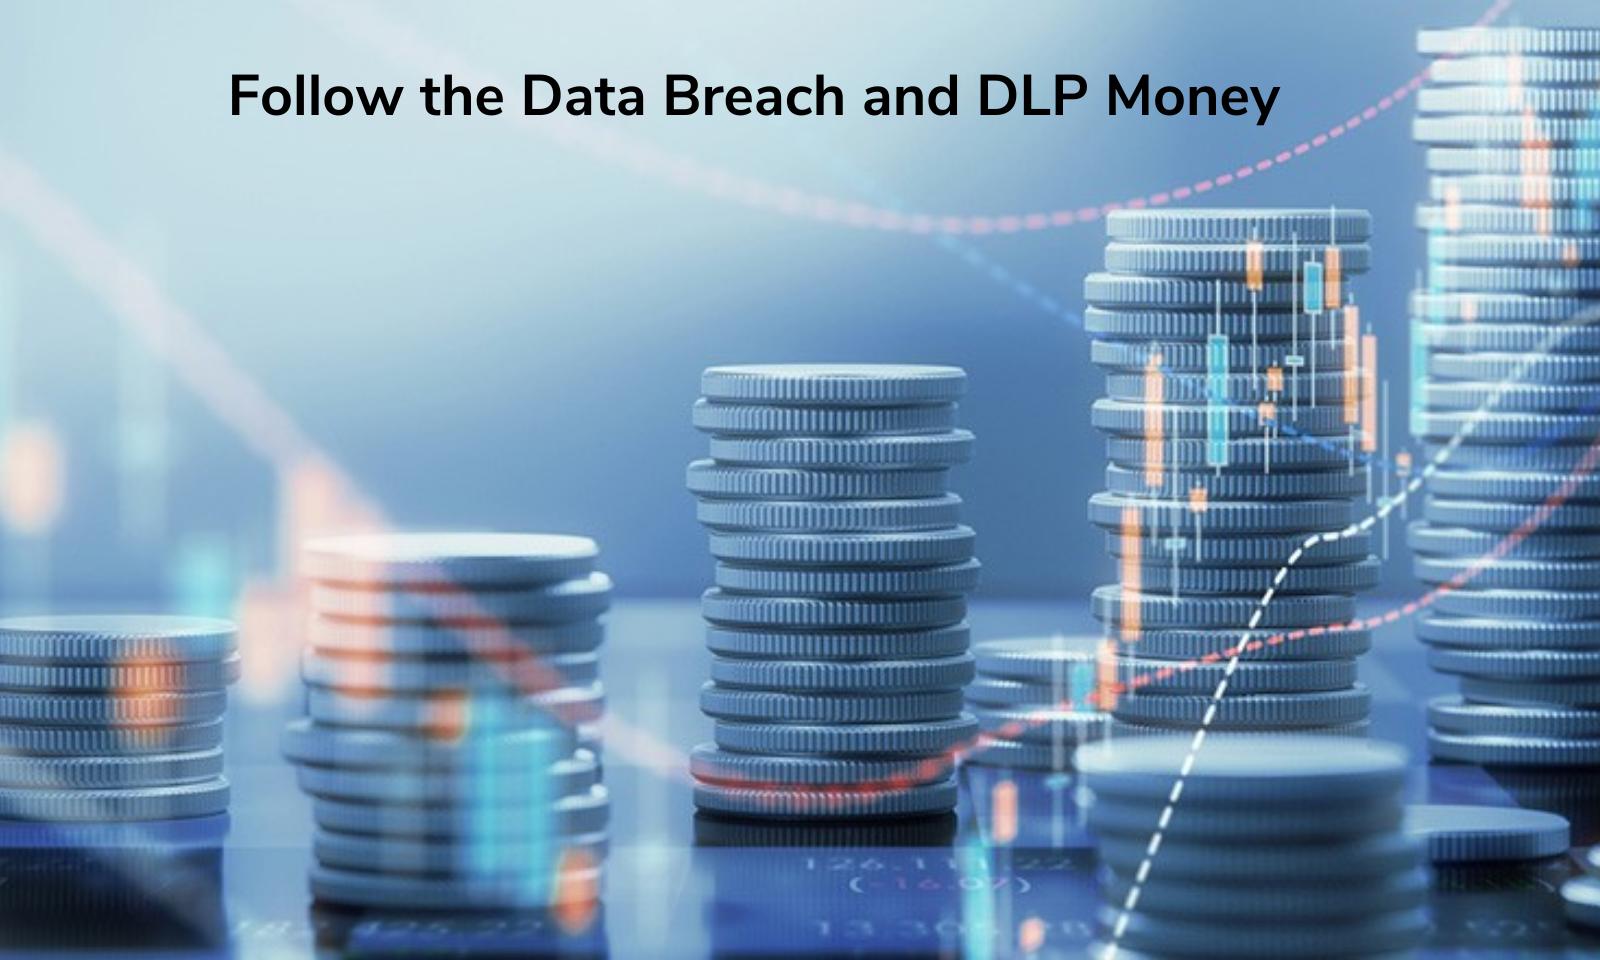 Follow the Data Breach and DLP Money